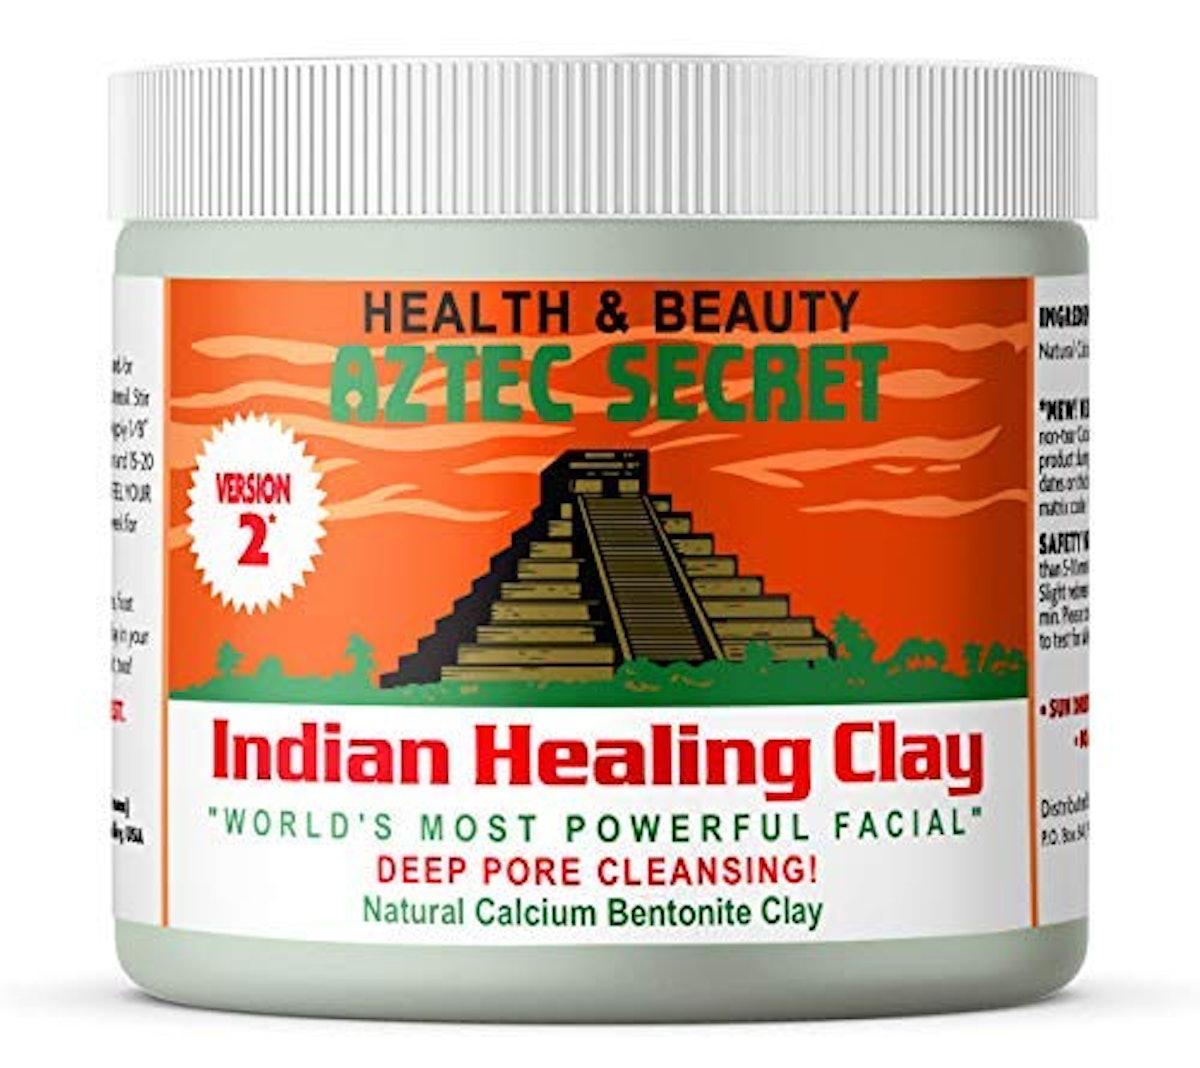 Aztec Secret Indian Healing Deep Pore Cleansing Clay Facial & Body Mask